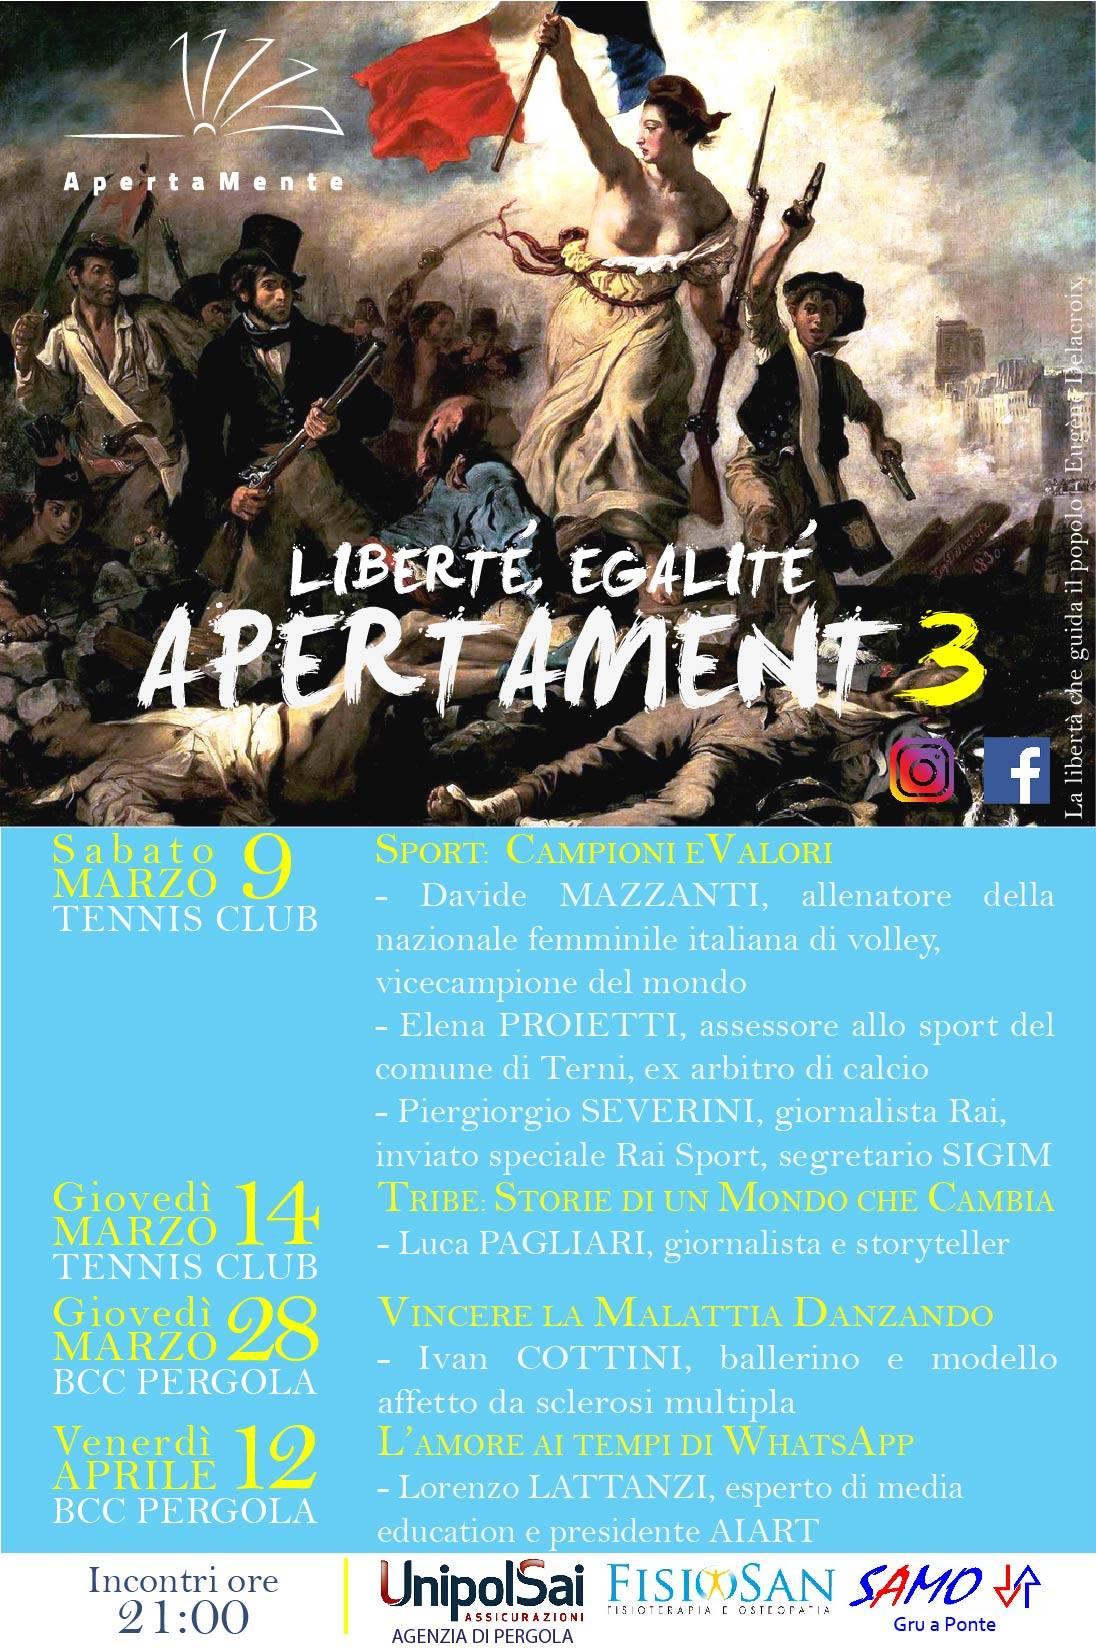 Programma Completo ApertaMent3